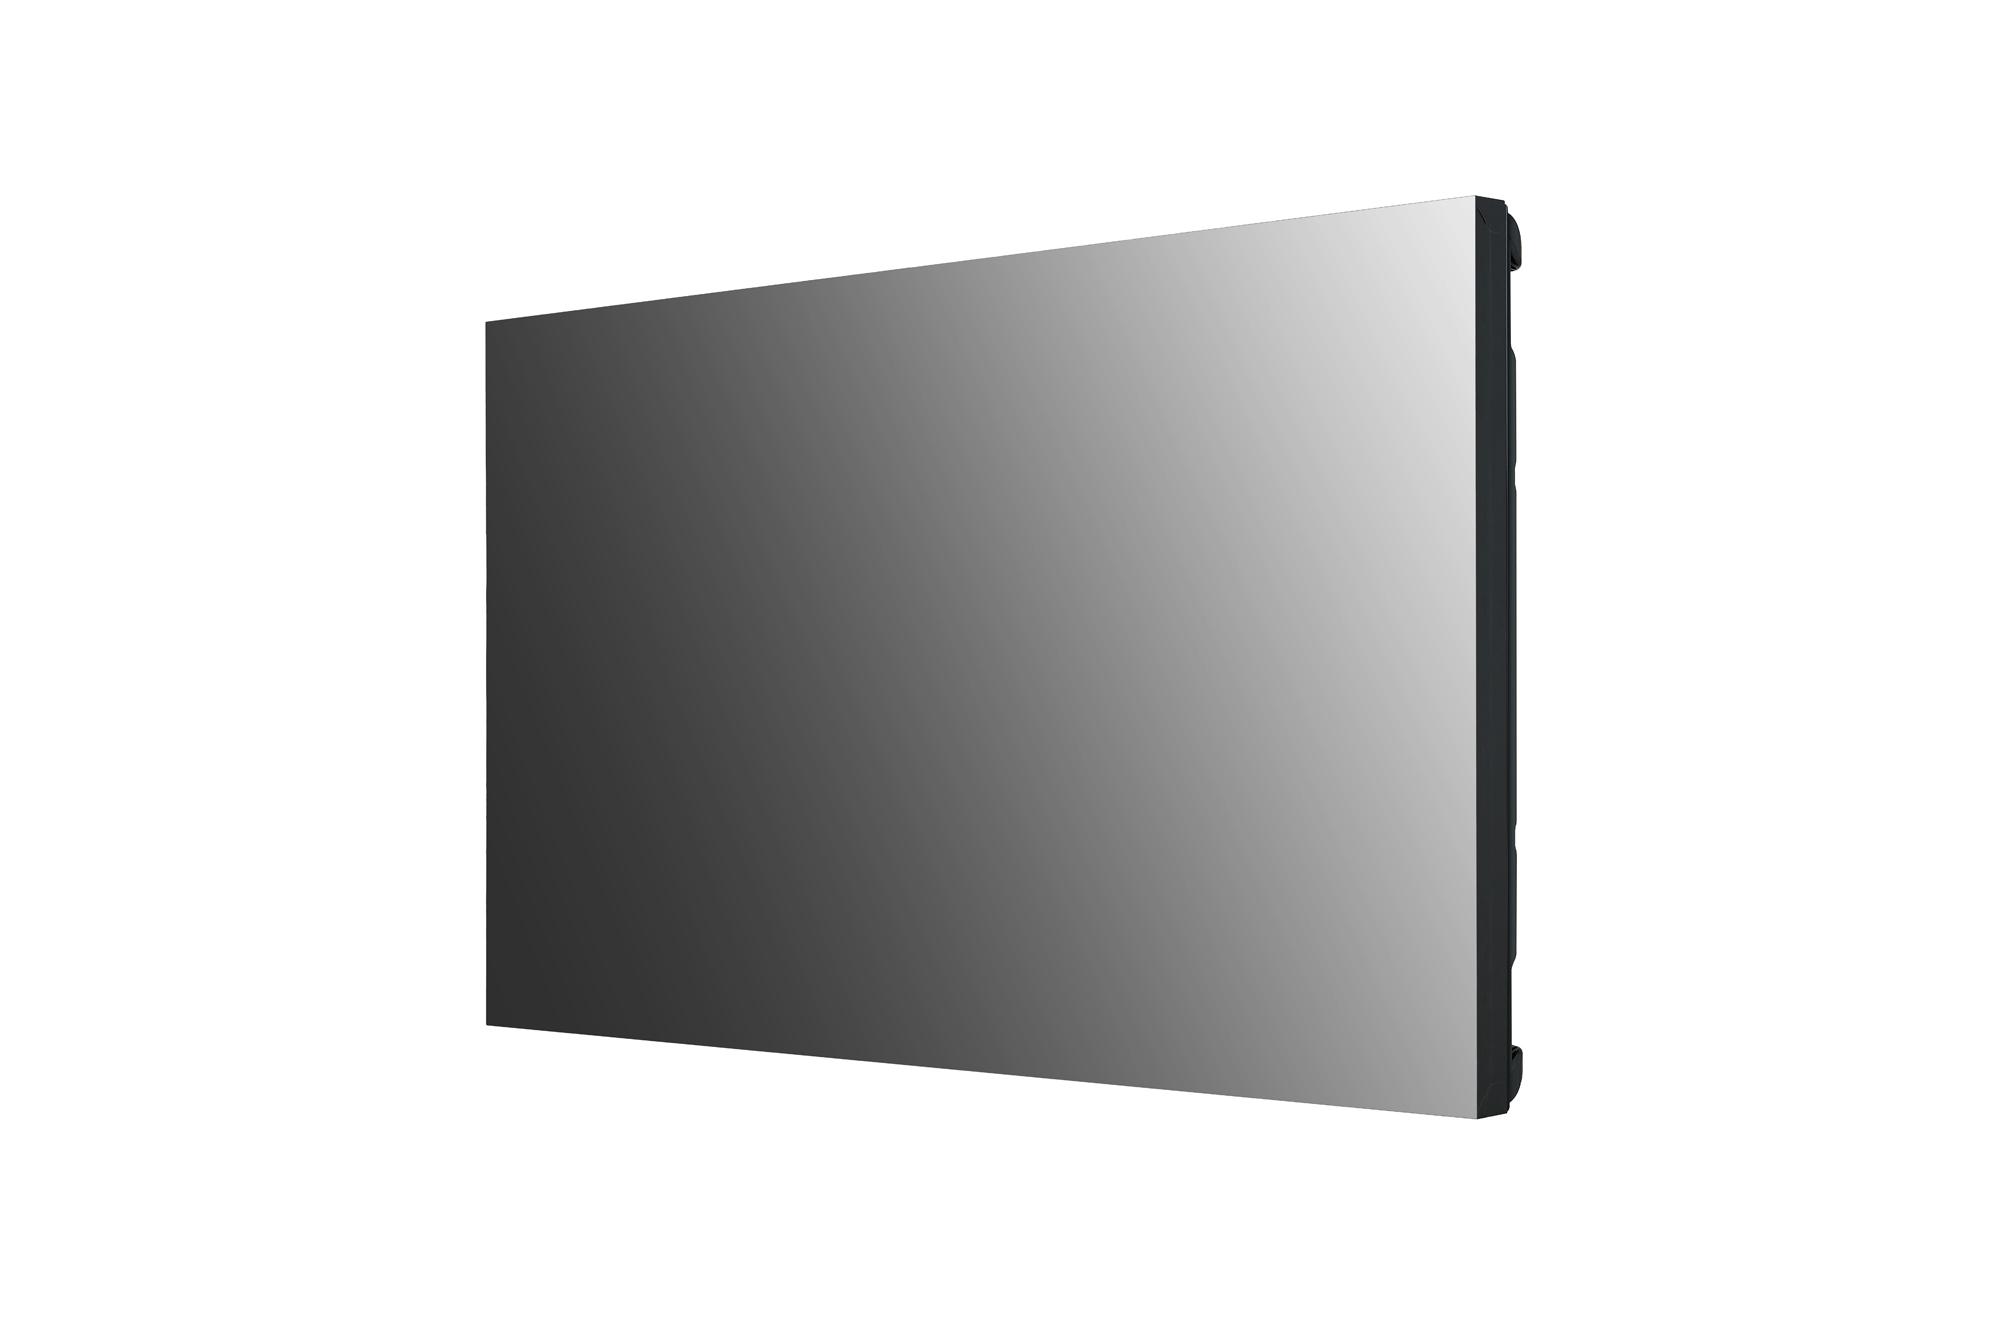 LG Video Wall 55SVH7PF-H 6